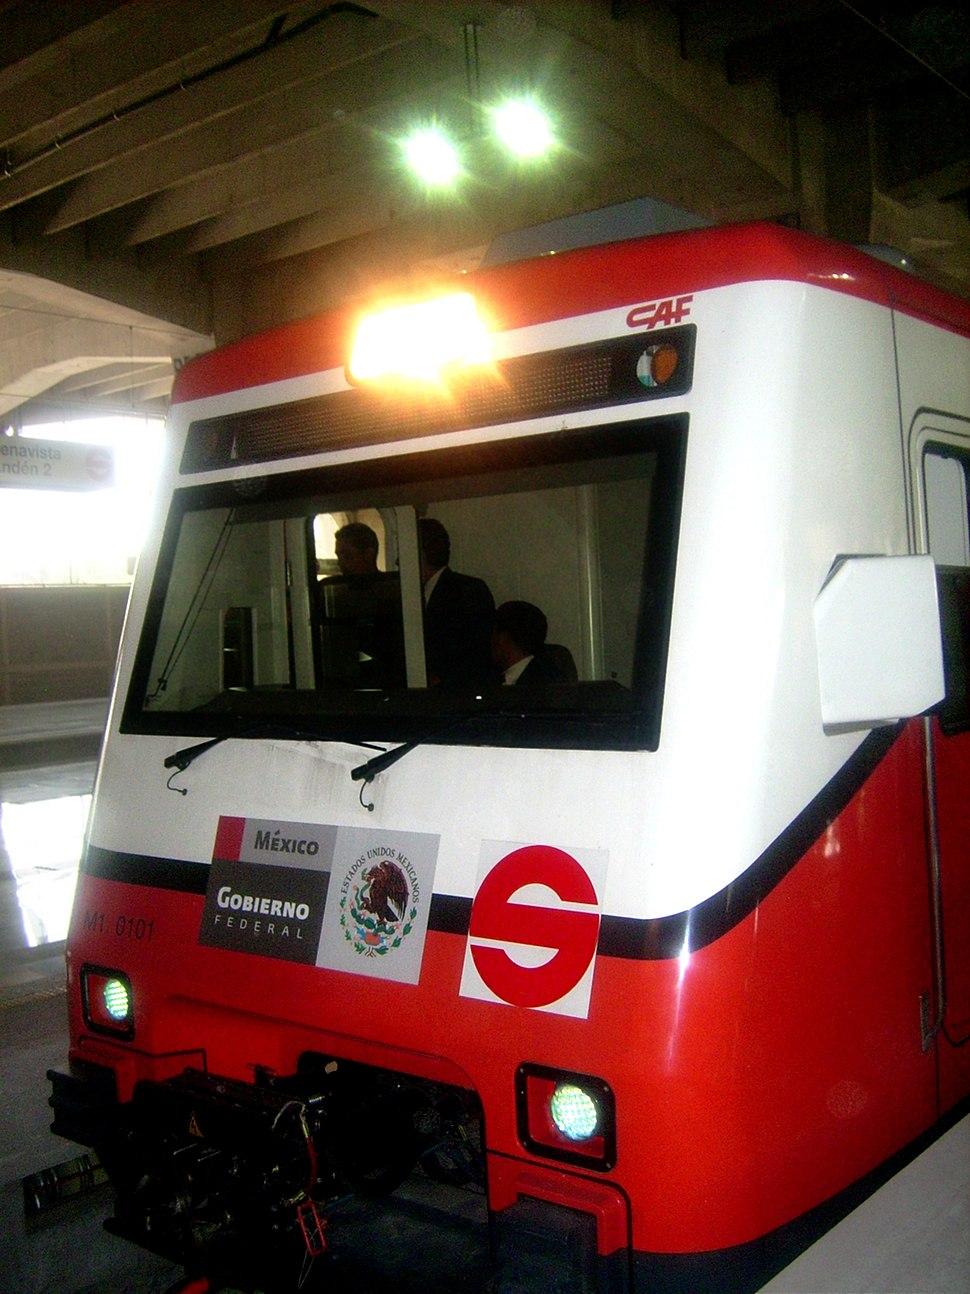 TrenSuburbanodelValledeMéxicoSistema1